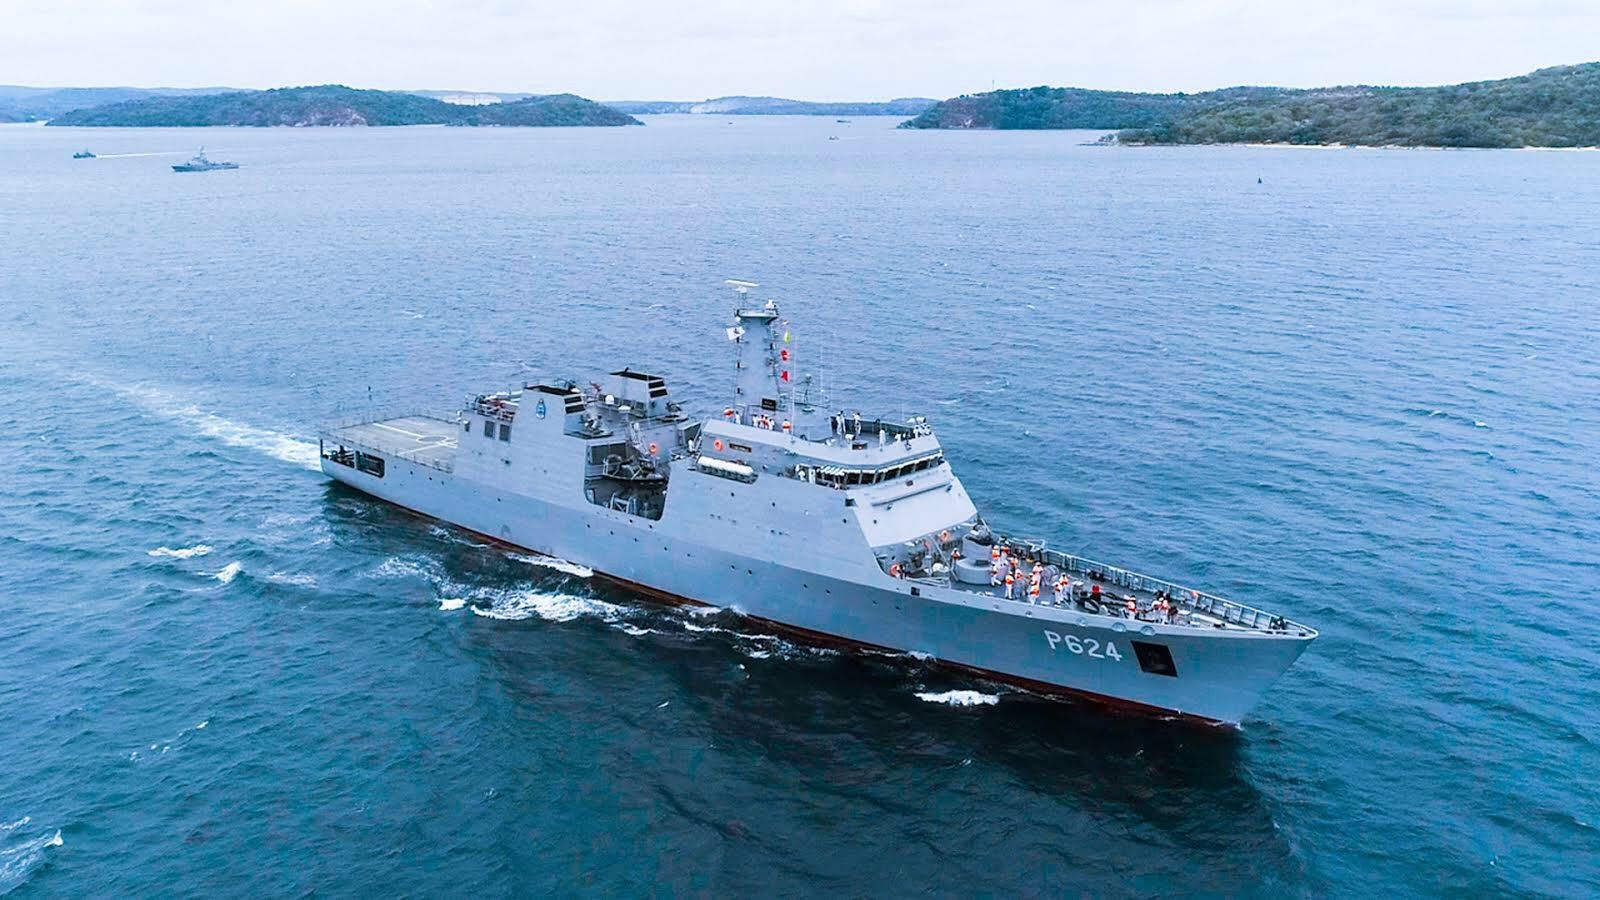 How Women Reclaimed Their Island From the Sri Lankan Navy